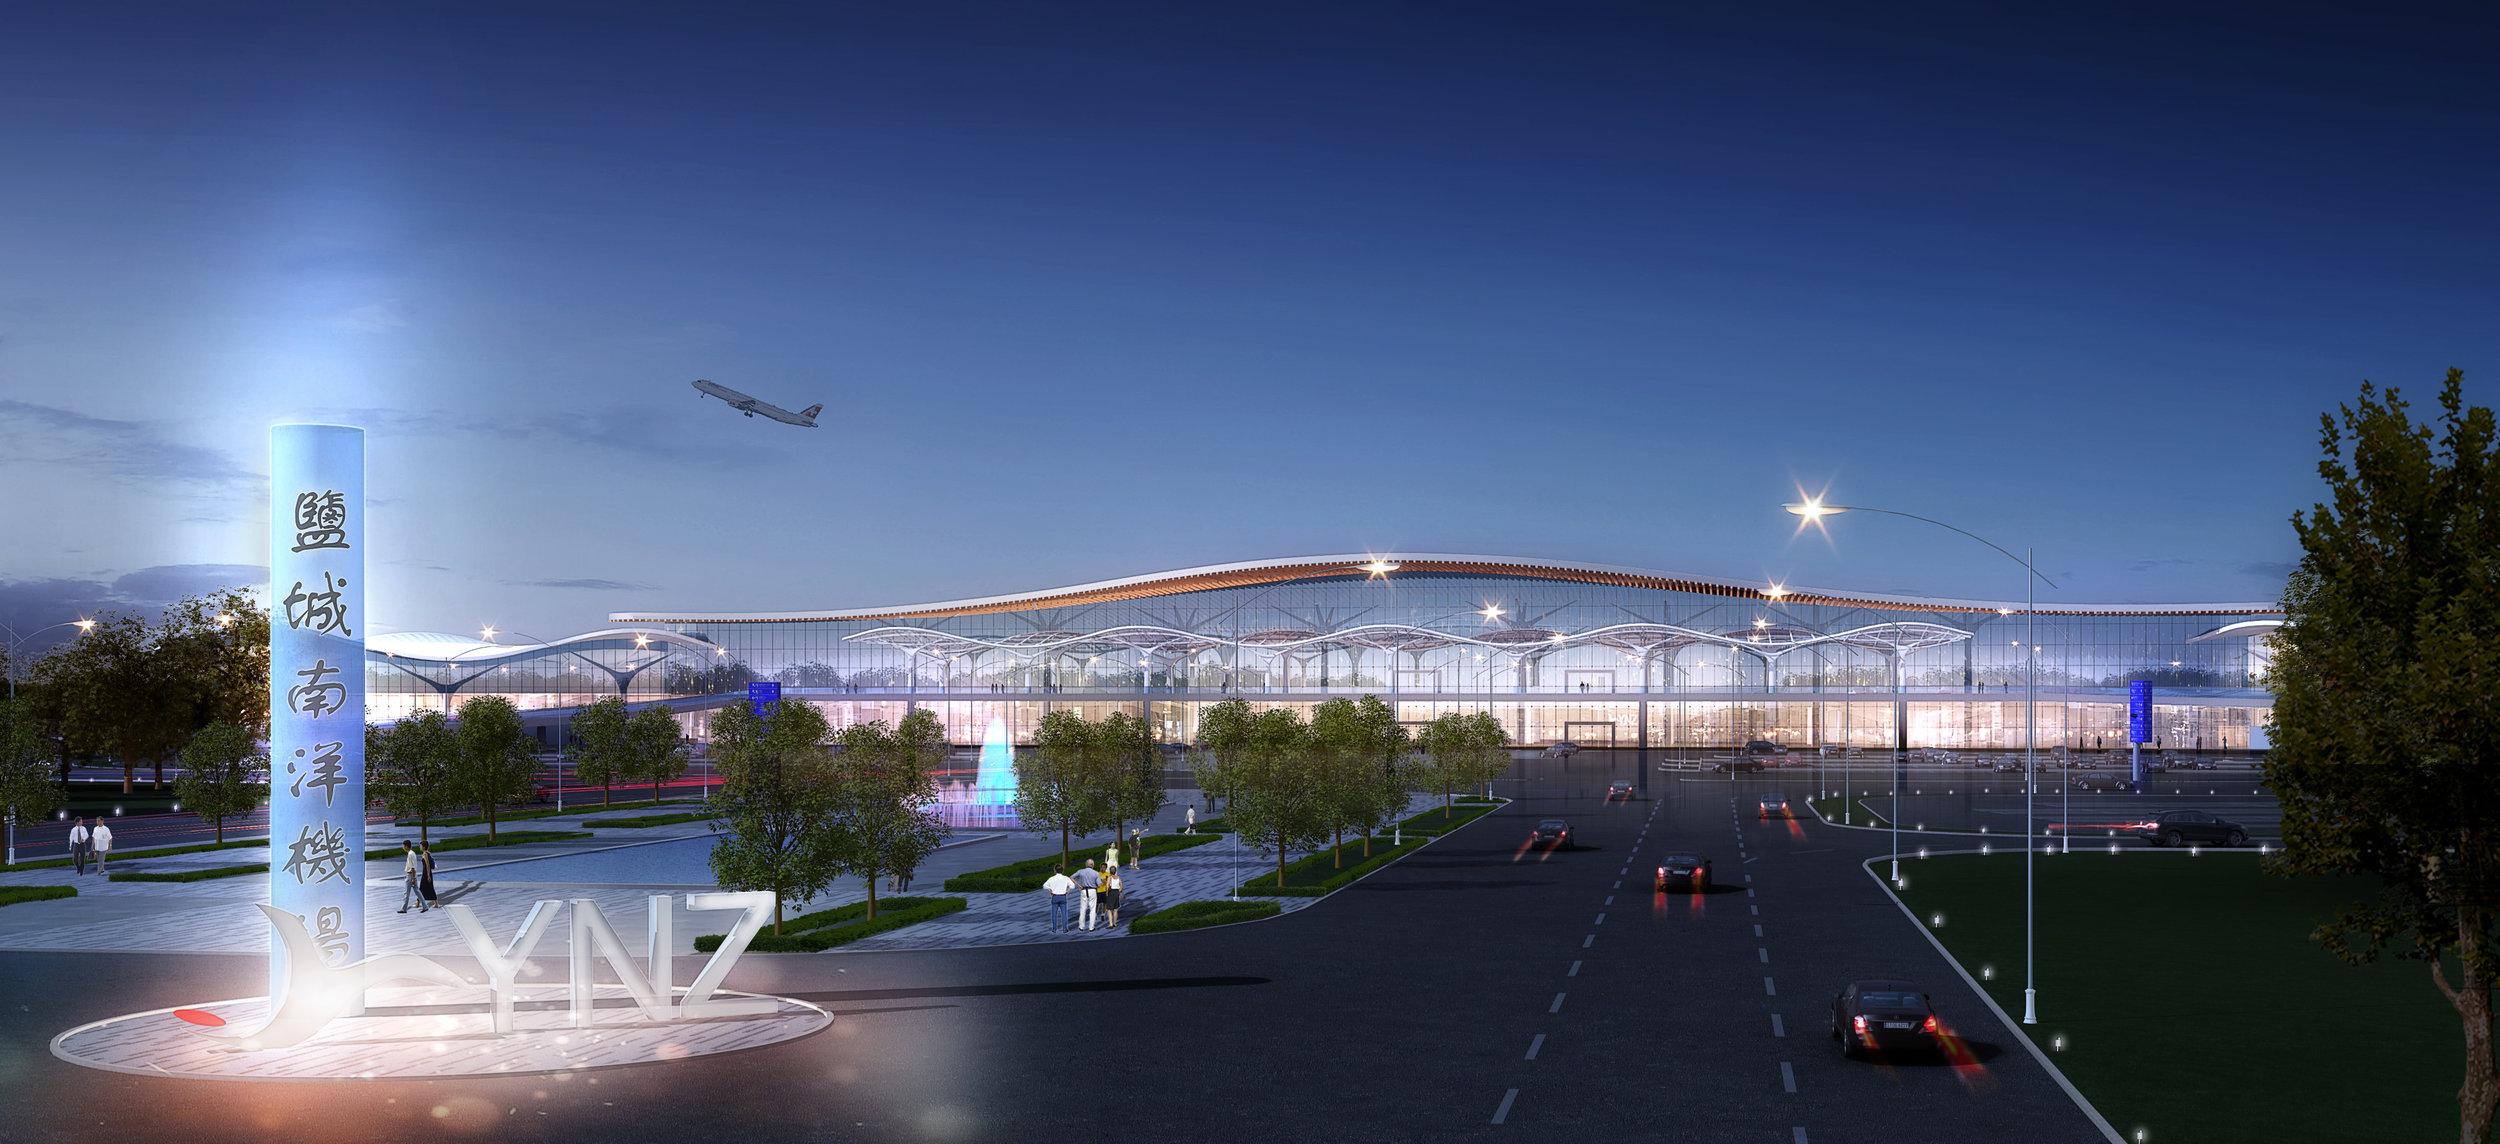 Yancheng Airport<br>鹽城南洋機場